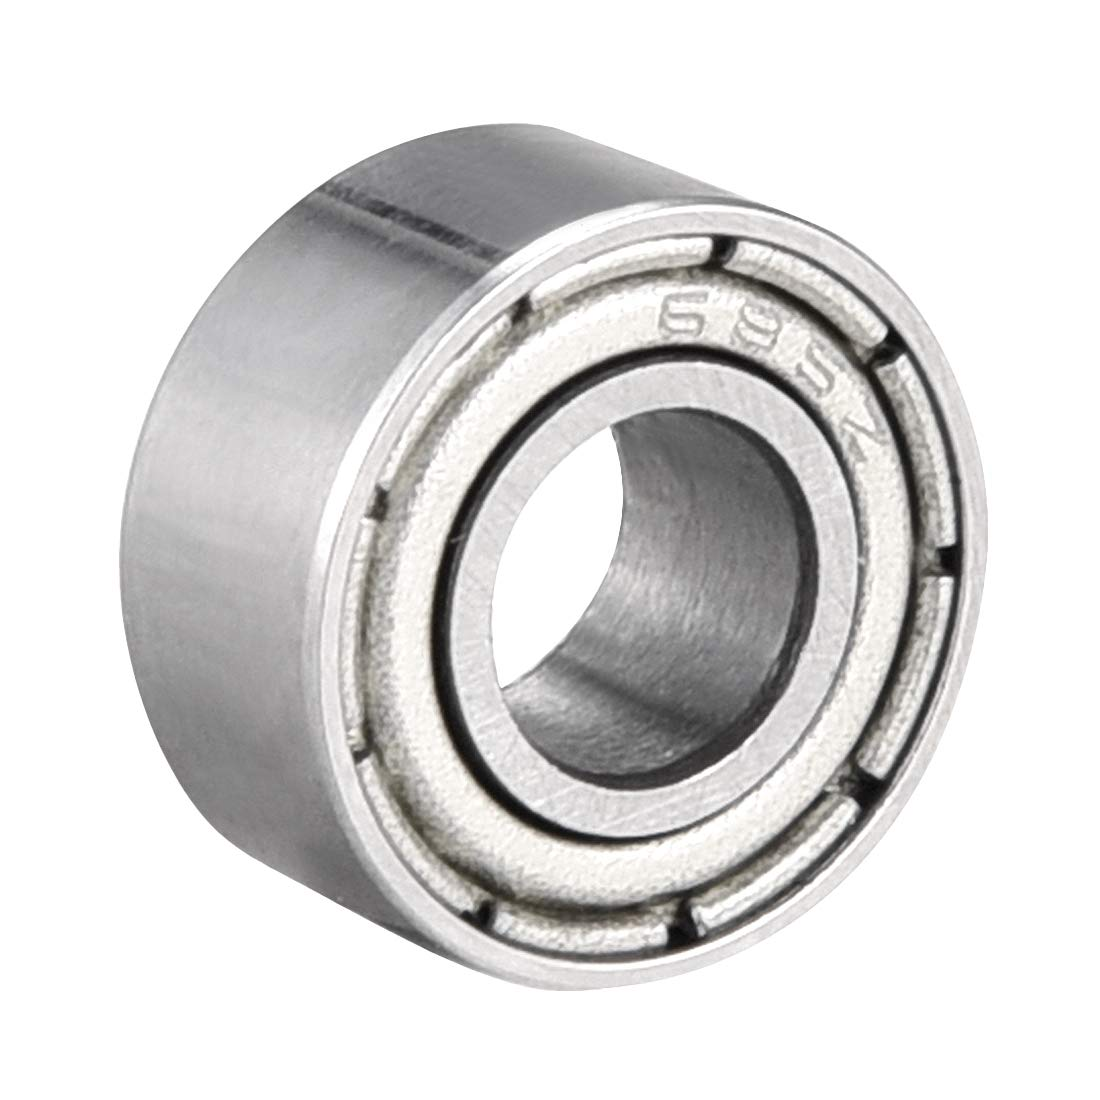 10Pcs 685ZZ 11 x 11 x 5mm Dual Metal Shielded Deep Groove Ball Bearings Sourcingmap US-SA-AJD-68232